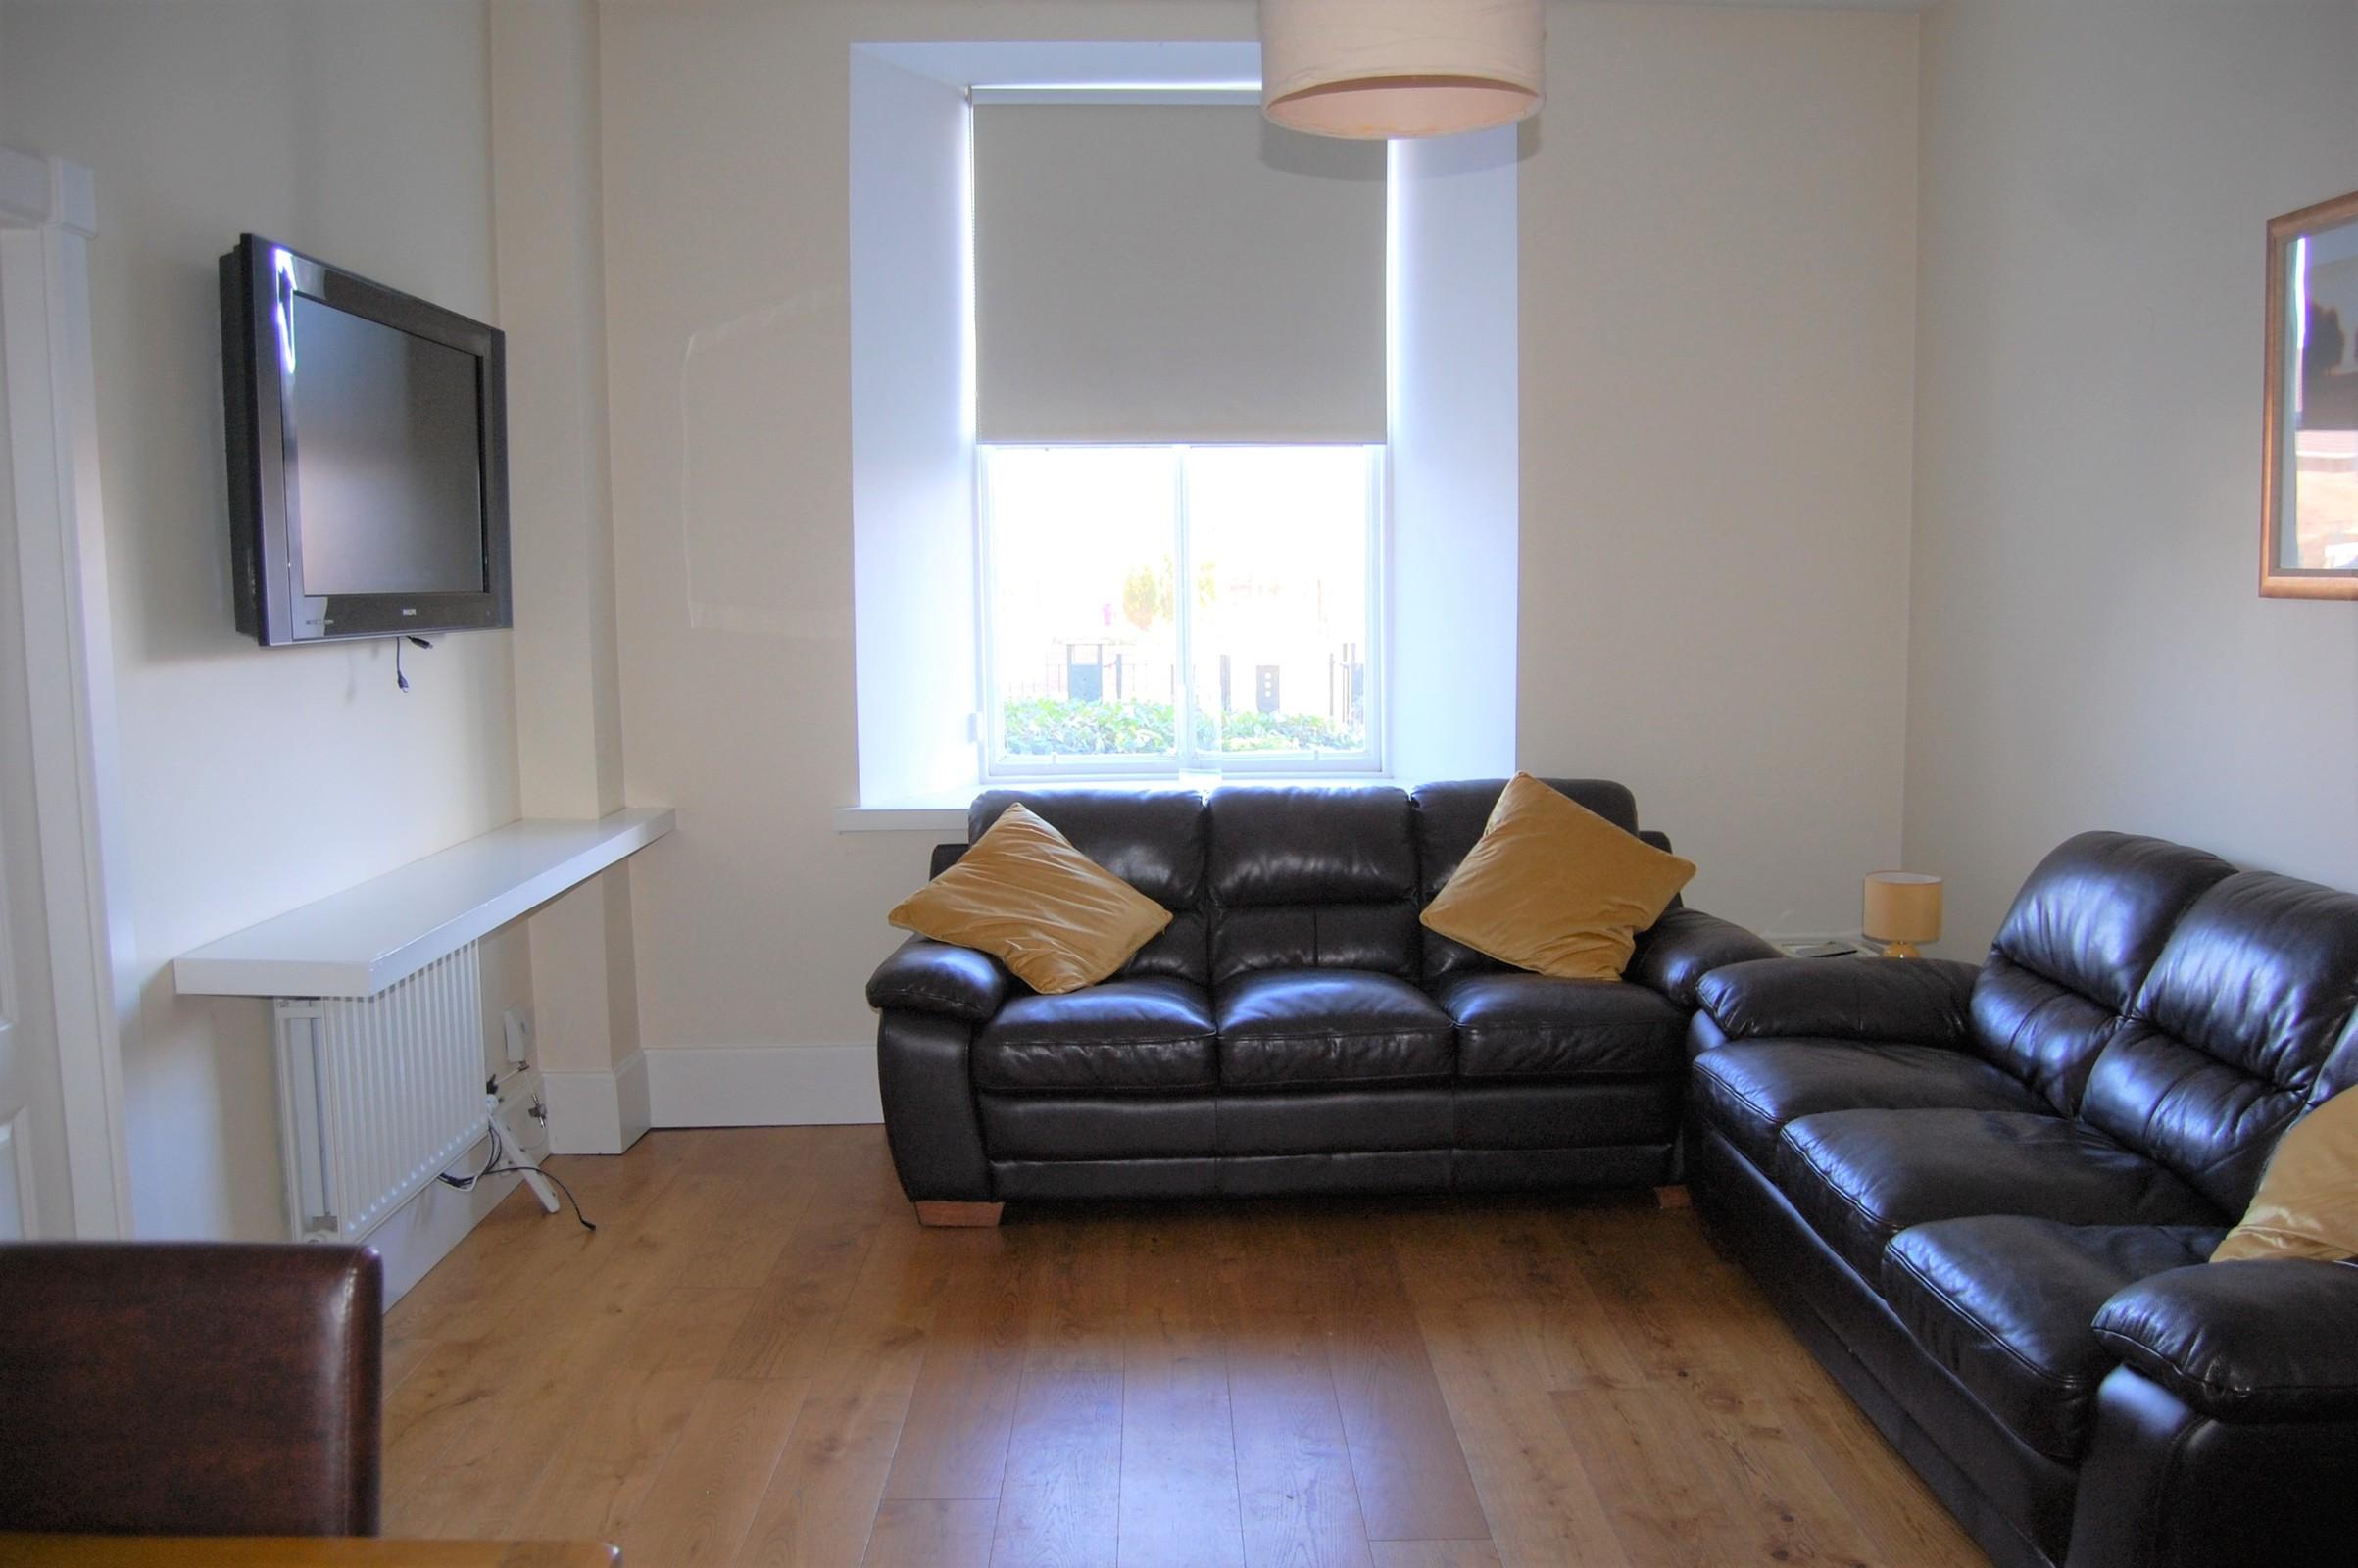 Apartment 1, Mullins Wing Apartments, Linden Squar, Blackrock, Co. Dublin